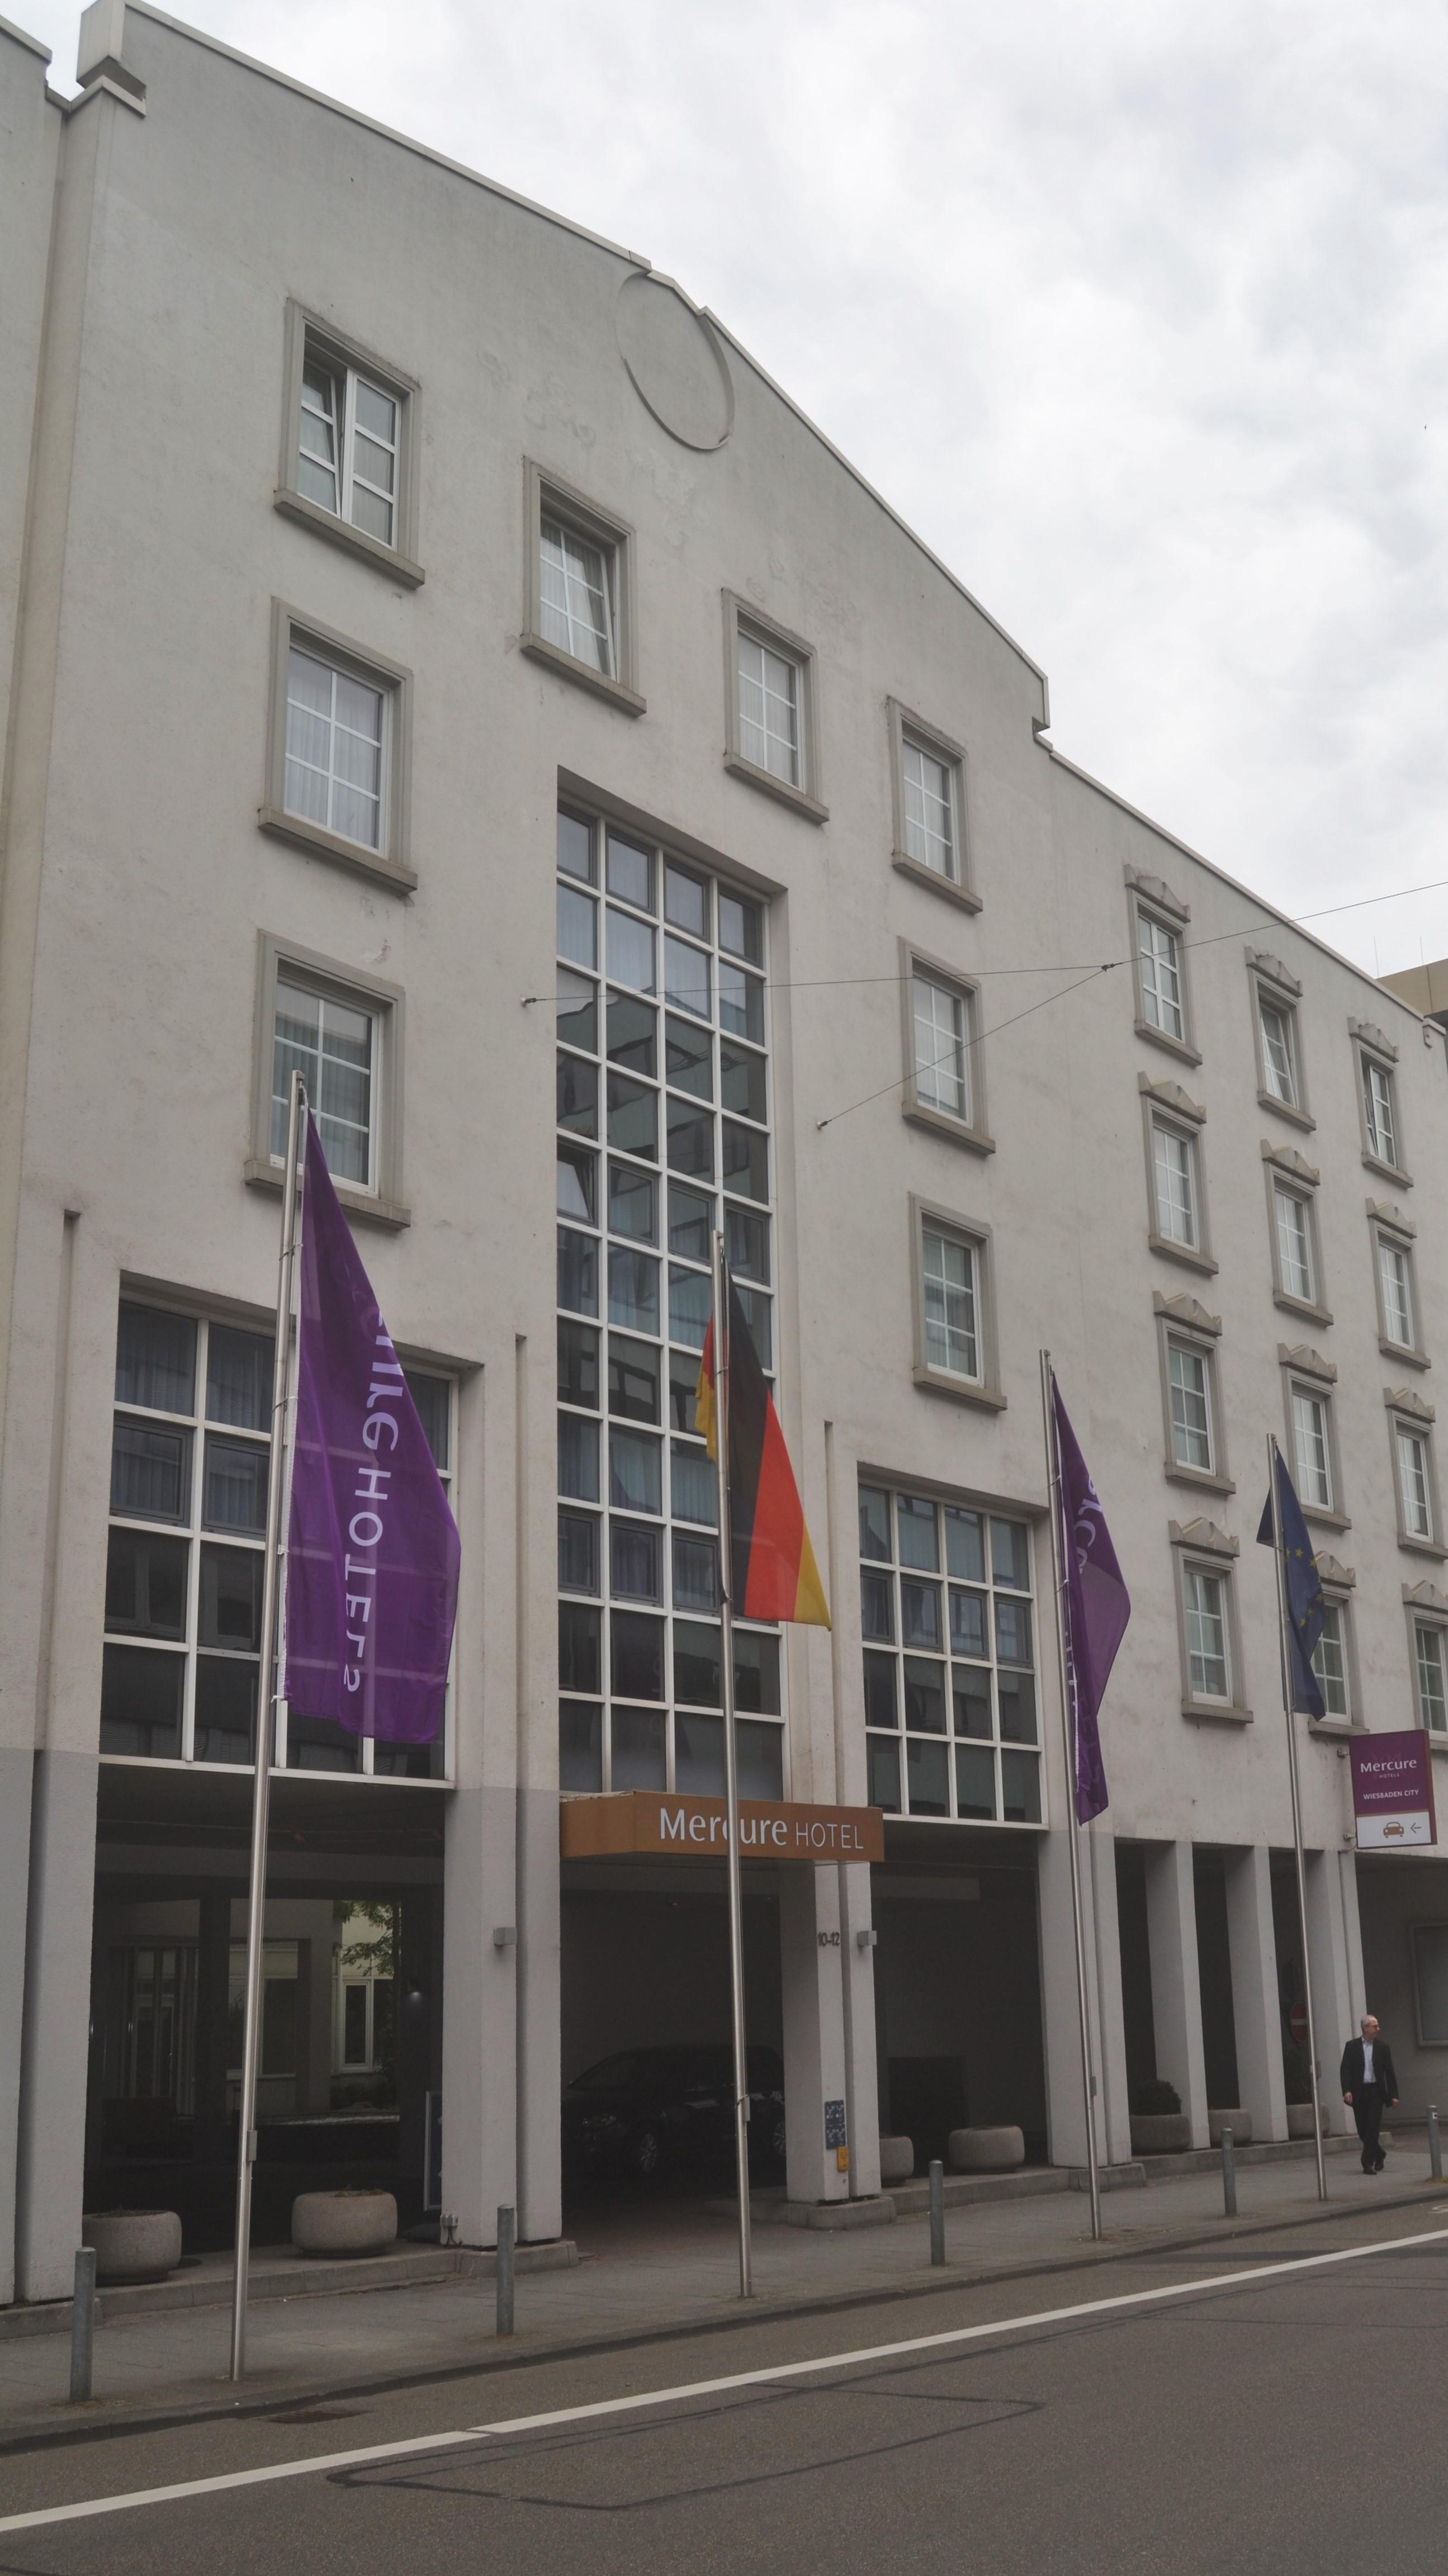 Mercure Hotel Ubernimmt Crowne Plaza In Der Bahnhofstrasse